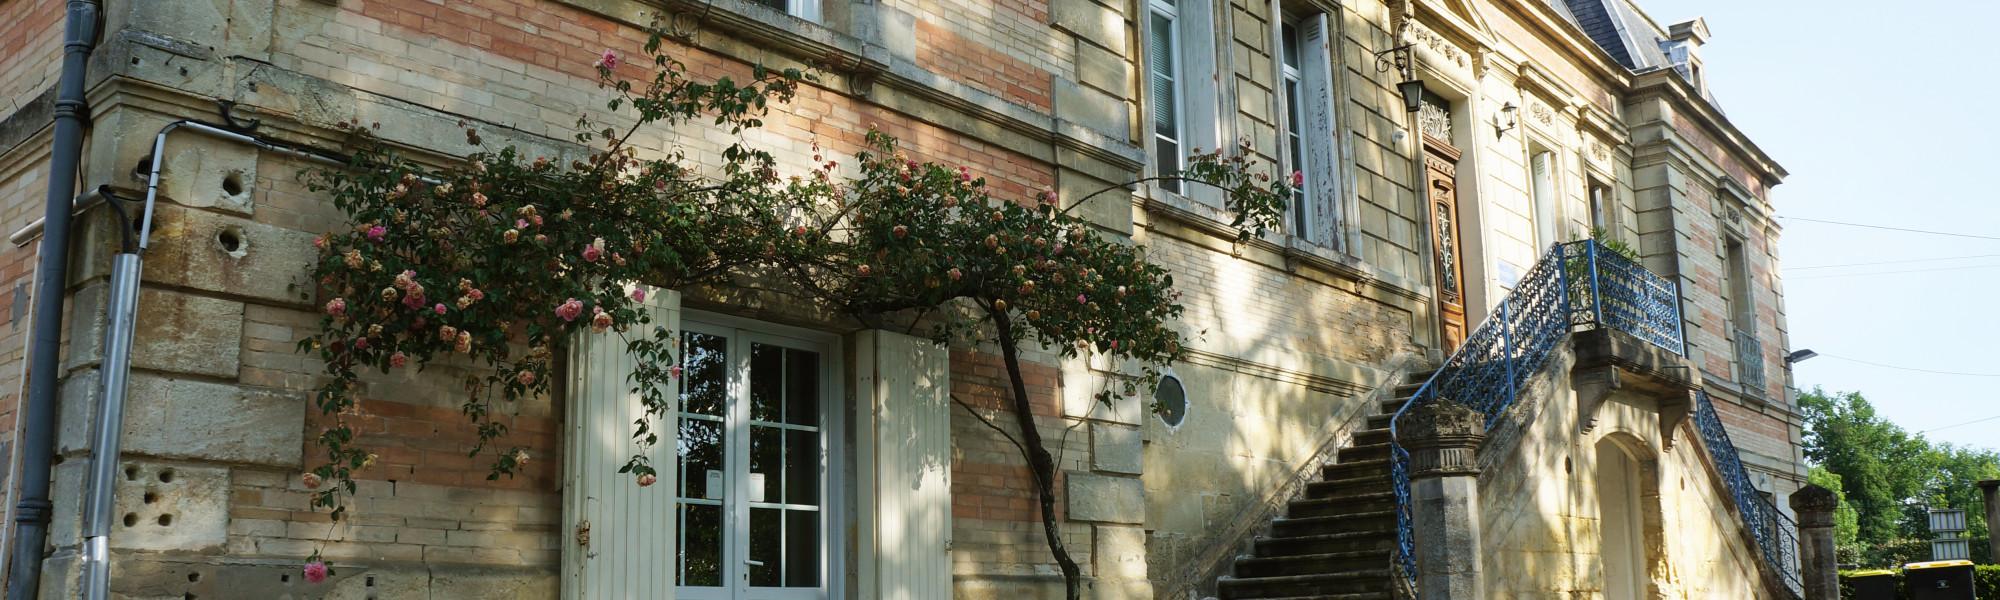 Château Bel Air EDEA